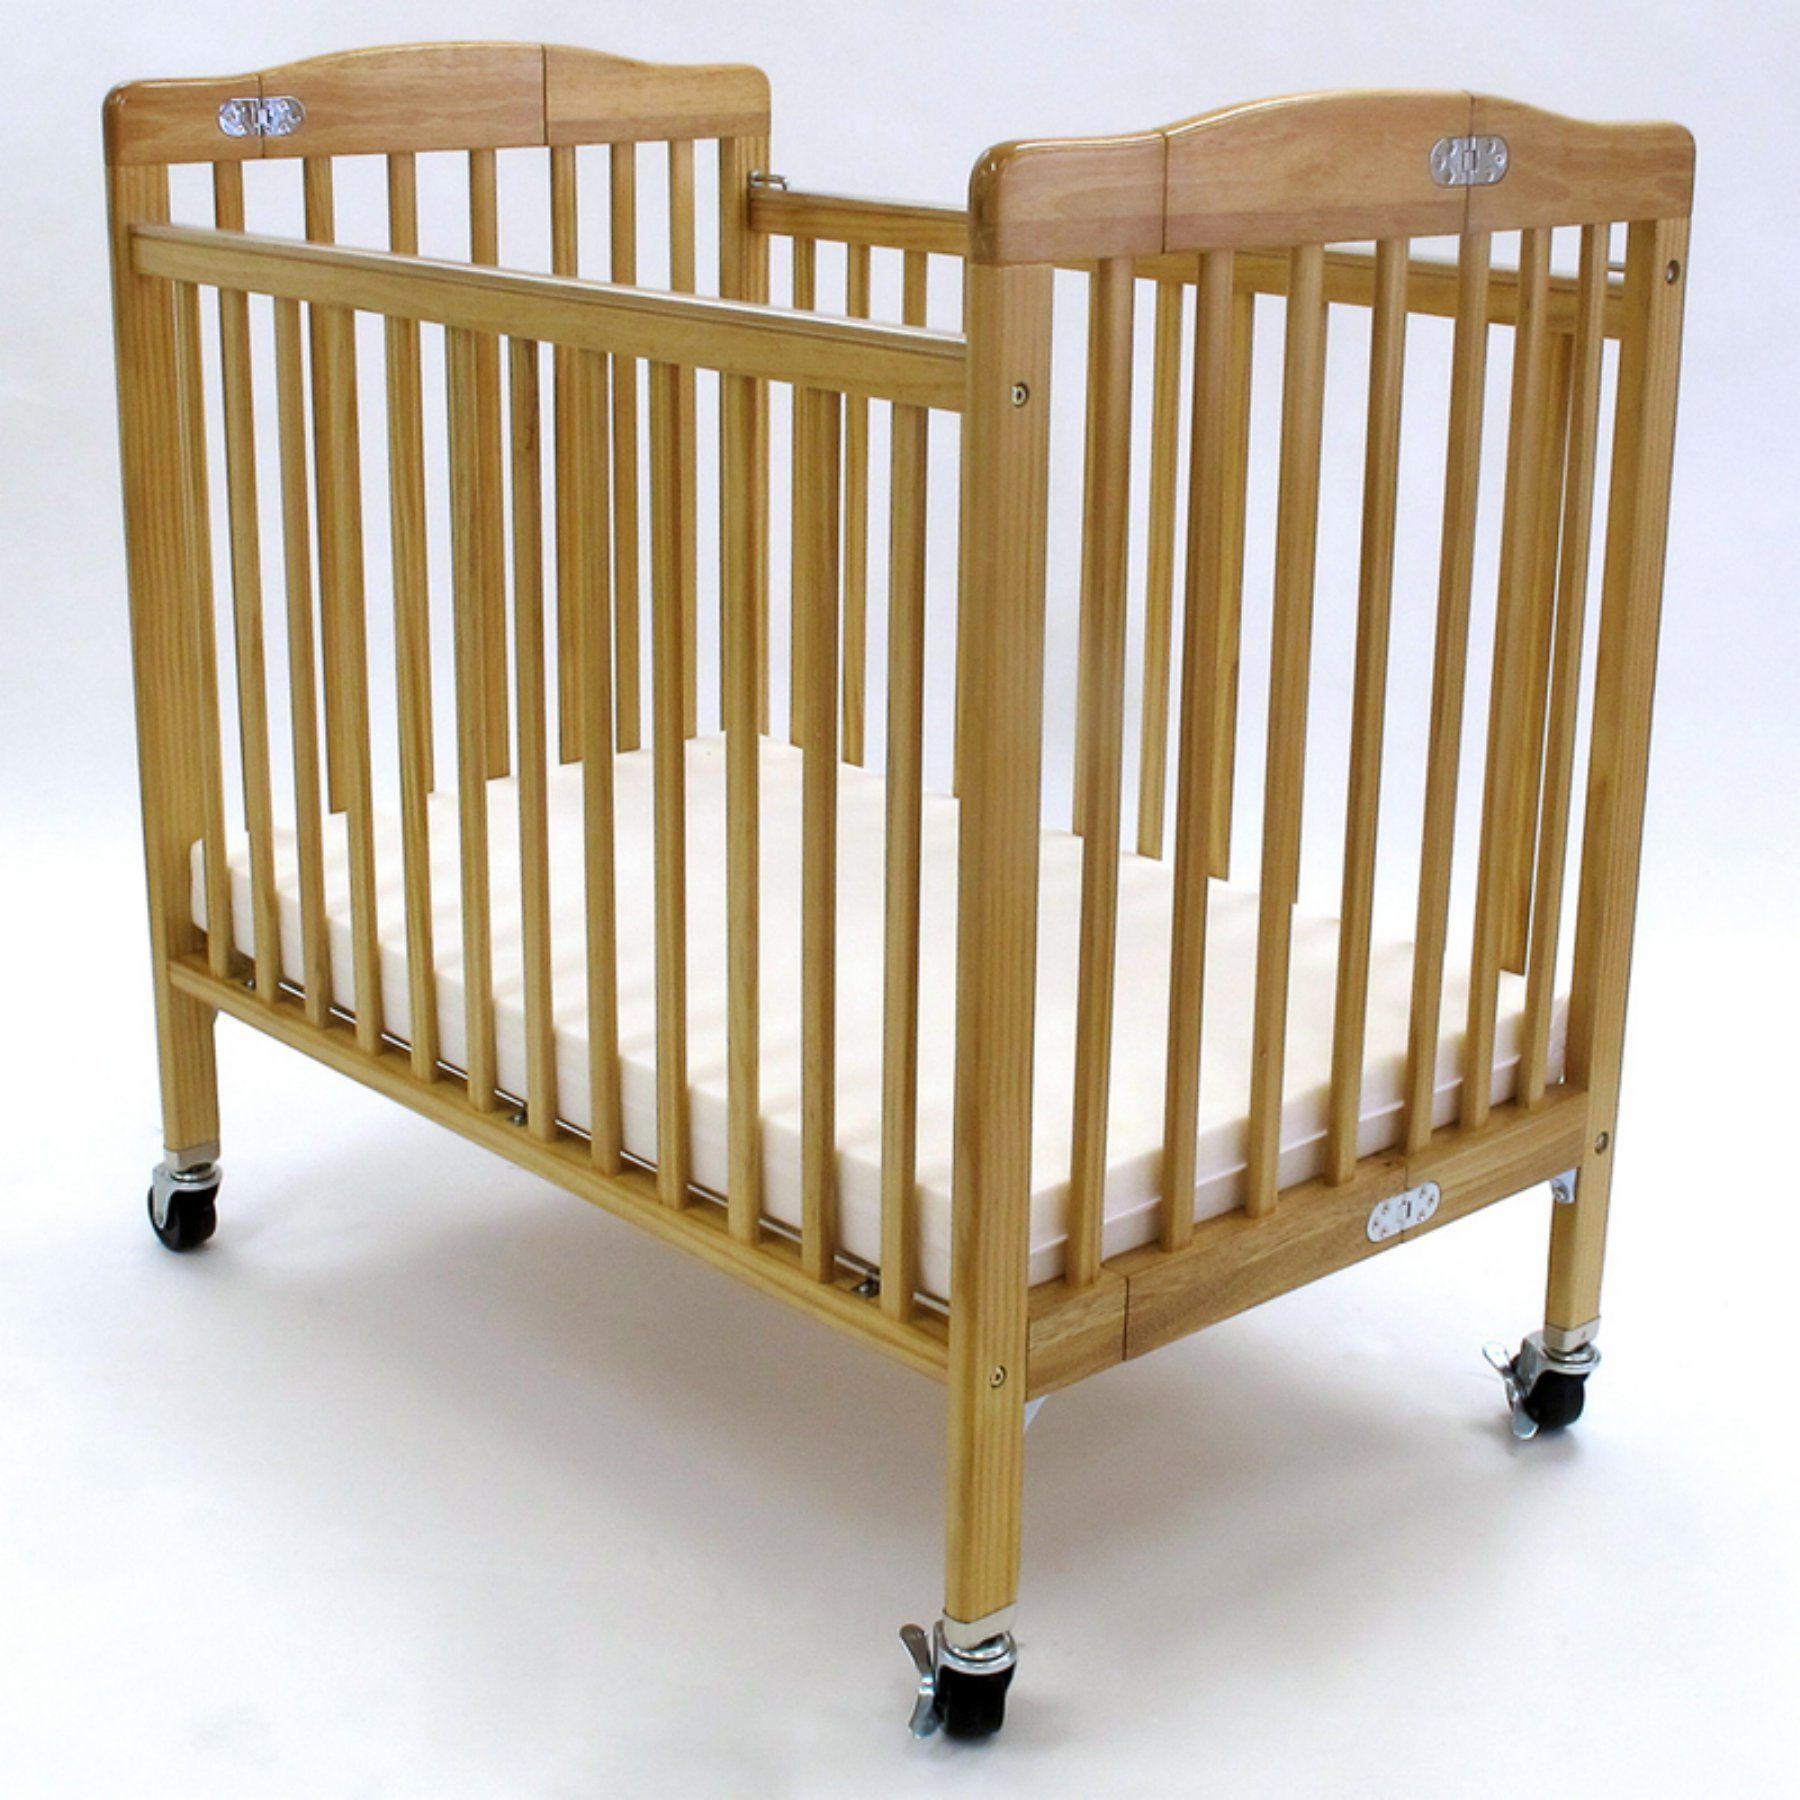 compact nursery furniture. LA Baby Pocket Compact Folding Wood Crib - Natural CW-888A-N Nursery Furniture K